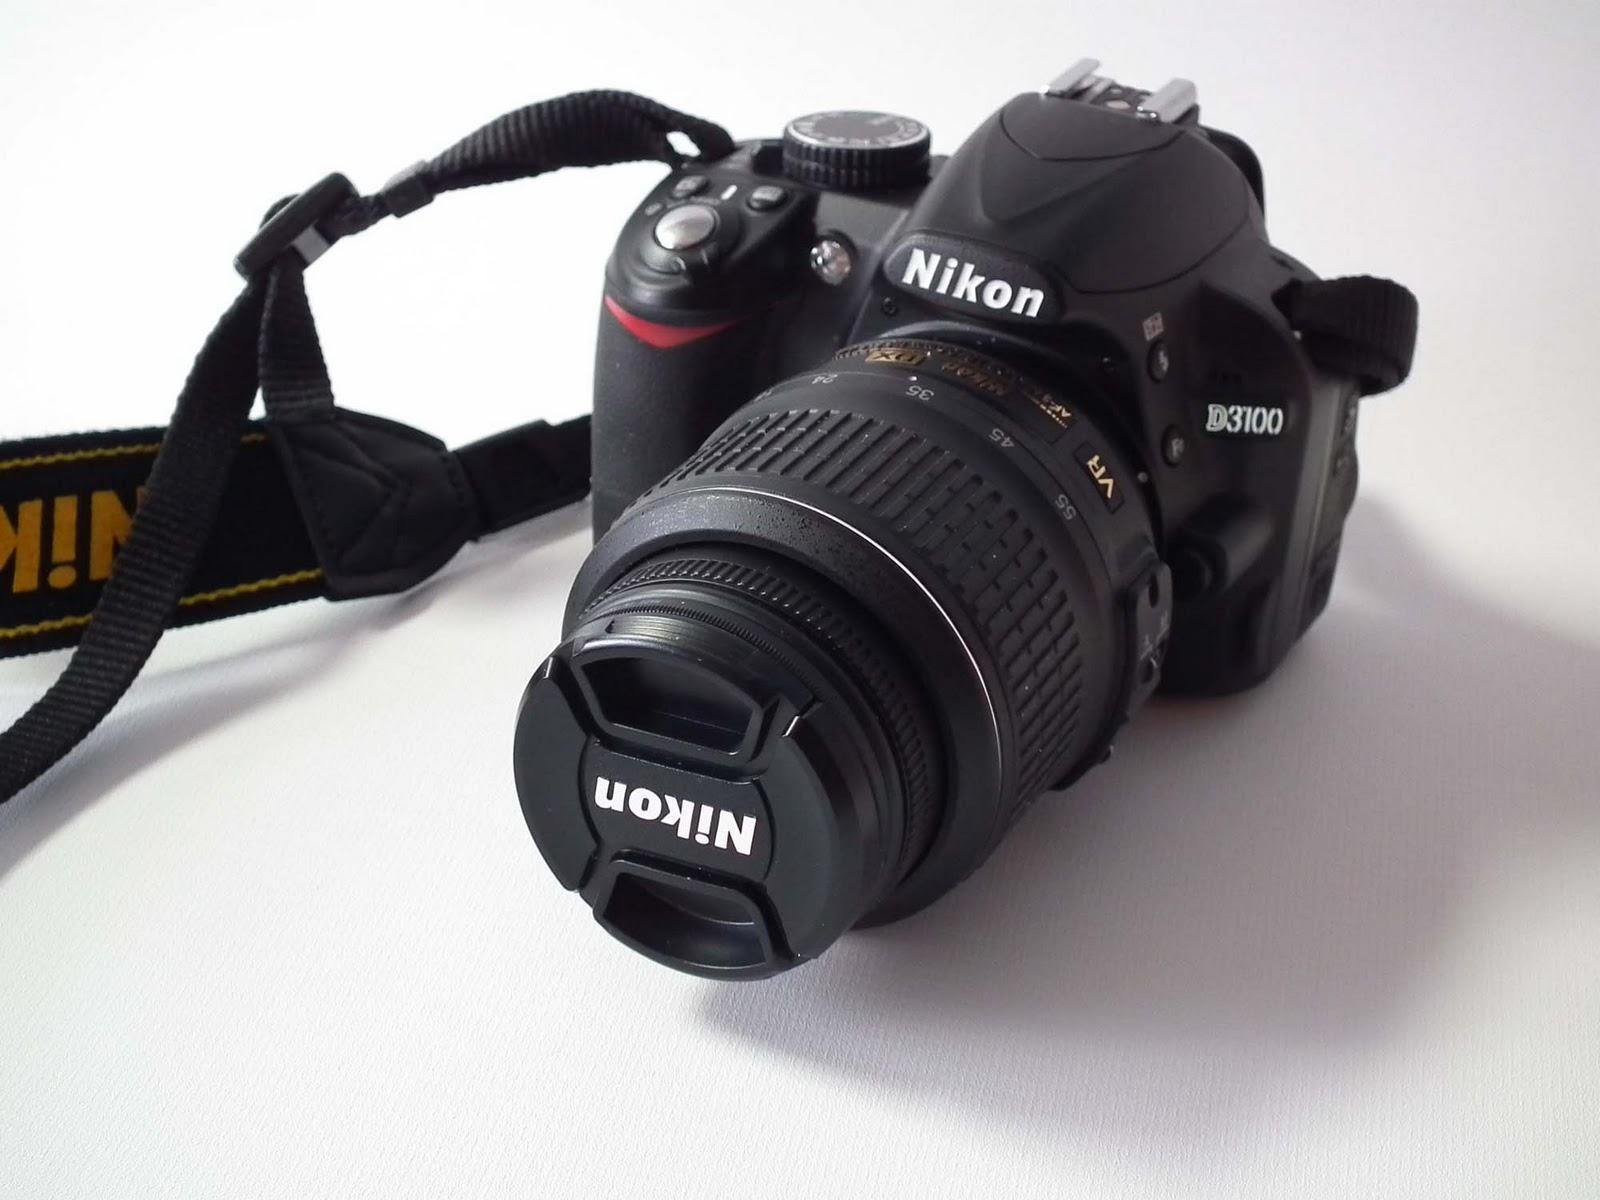 Más q foto: Análisis Nikon D3100